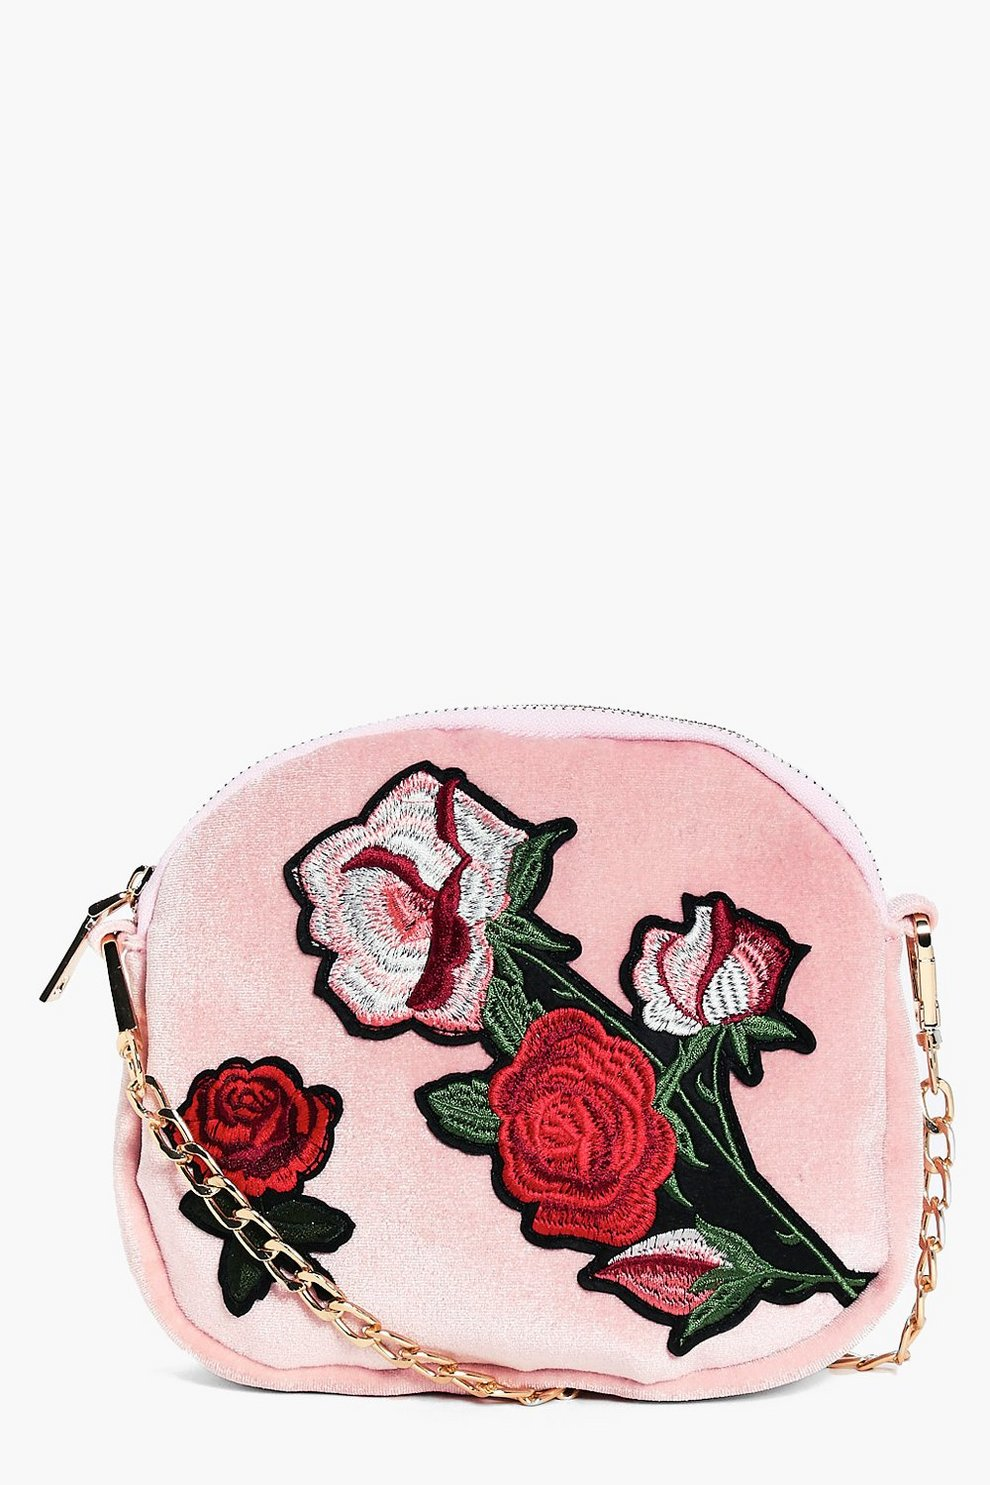 49301f74cef Ava Velvet Floral Embroidered Cross Body Bag | Boohoo